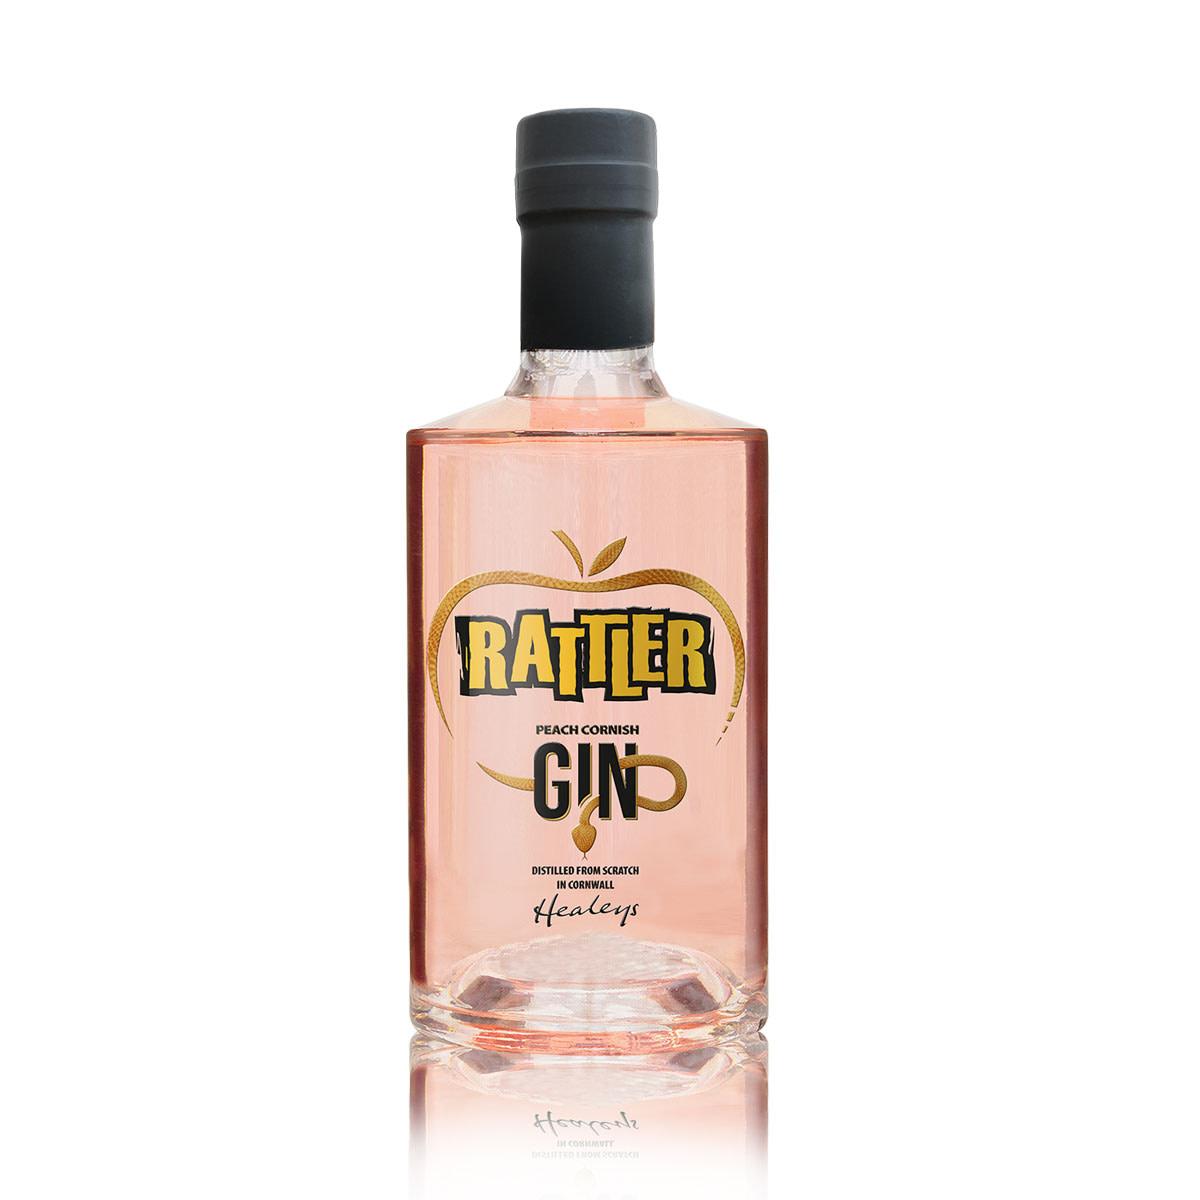 Rattler Peach Gin